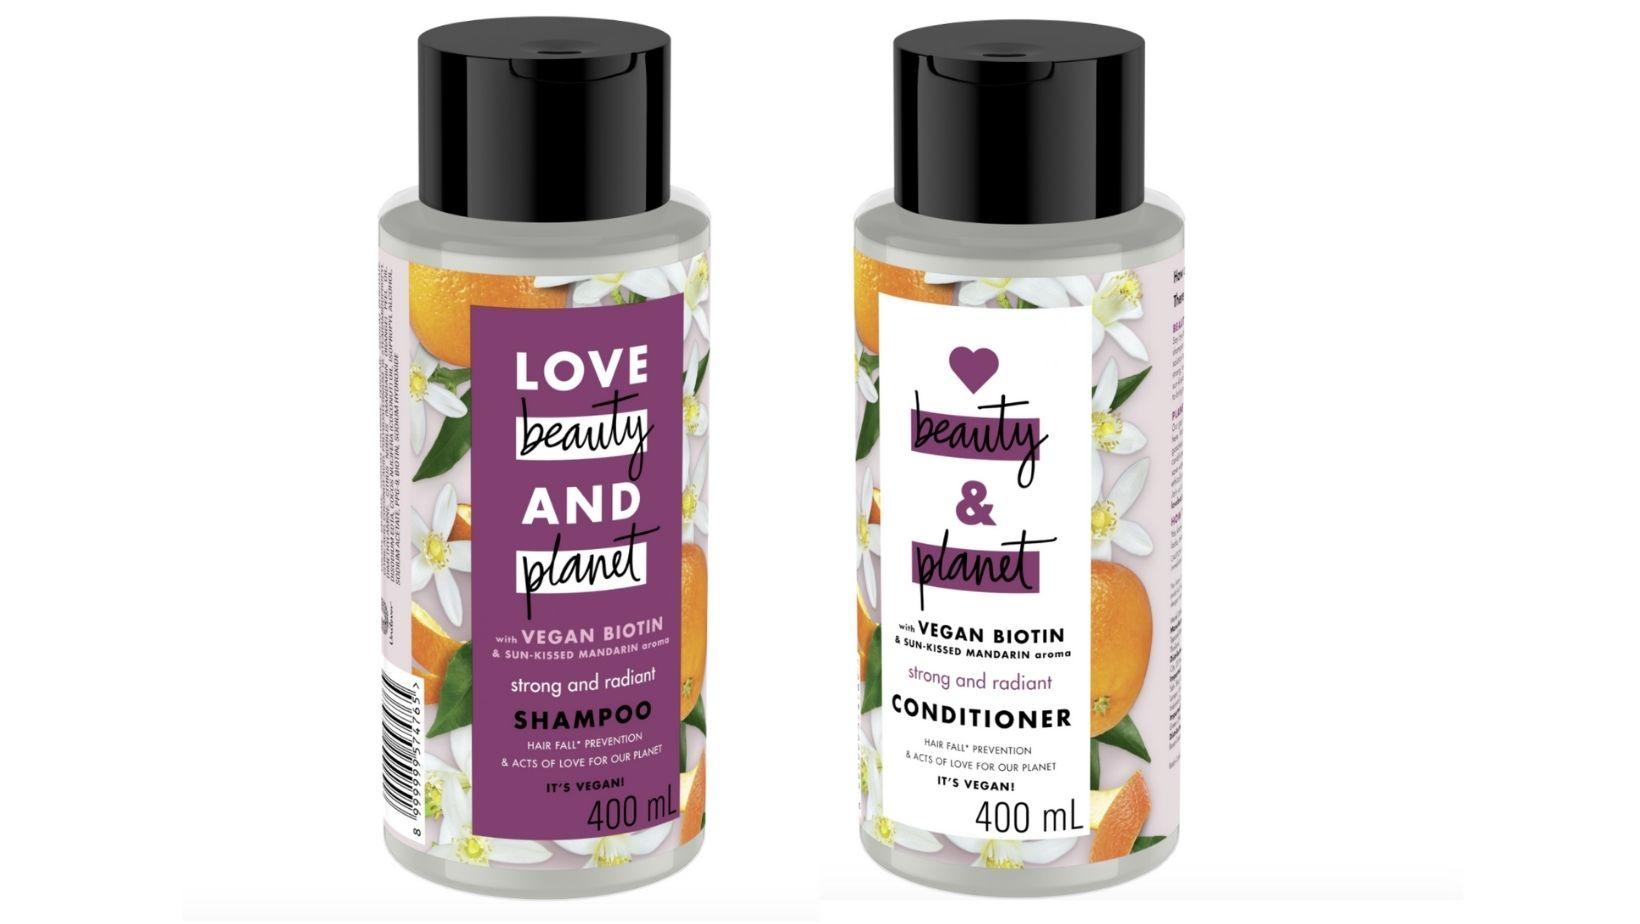 Love Beauty and Planet Vegan Biotin Anti Hair Fall Shampoo & Conditioner.